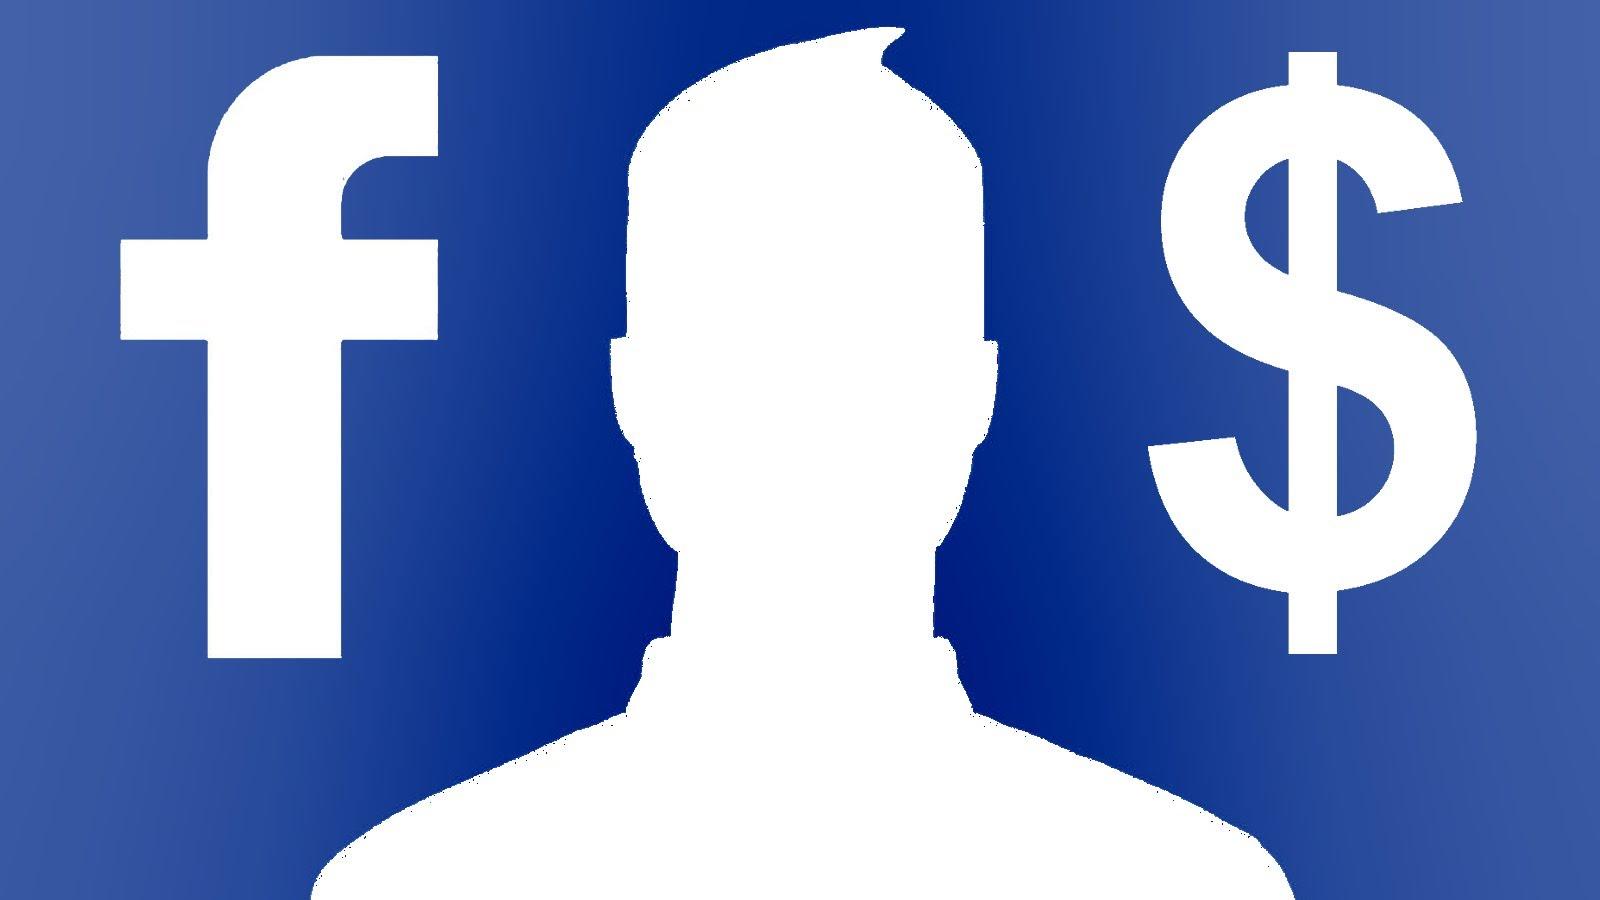 Facebook lập kỷ lục doanh số 12,46 tỉ, lợi nhuận 2,94 tỉ USD trong năm 2014 5